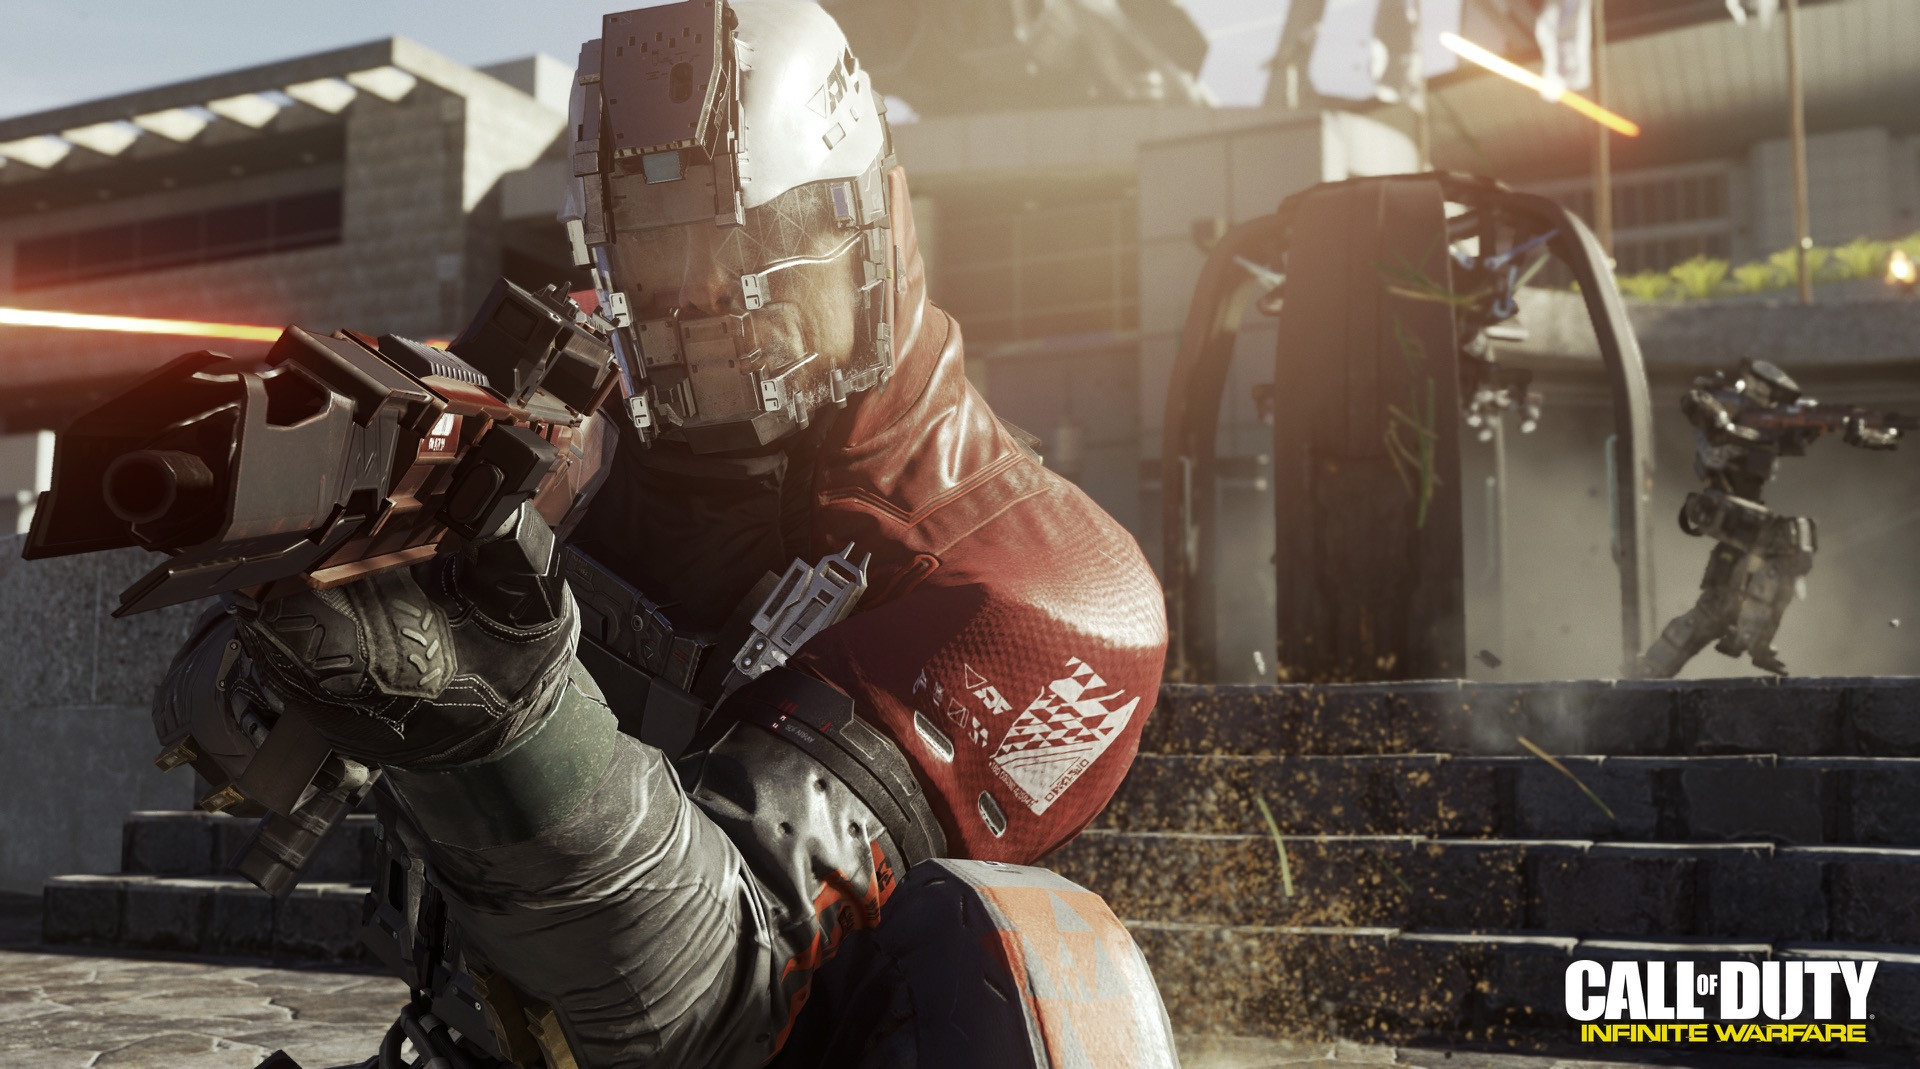 call-of-duty-infinite-warfare-game-igra-videoigra